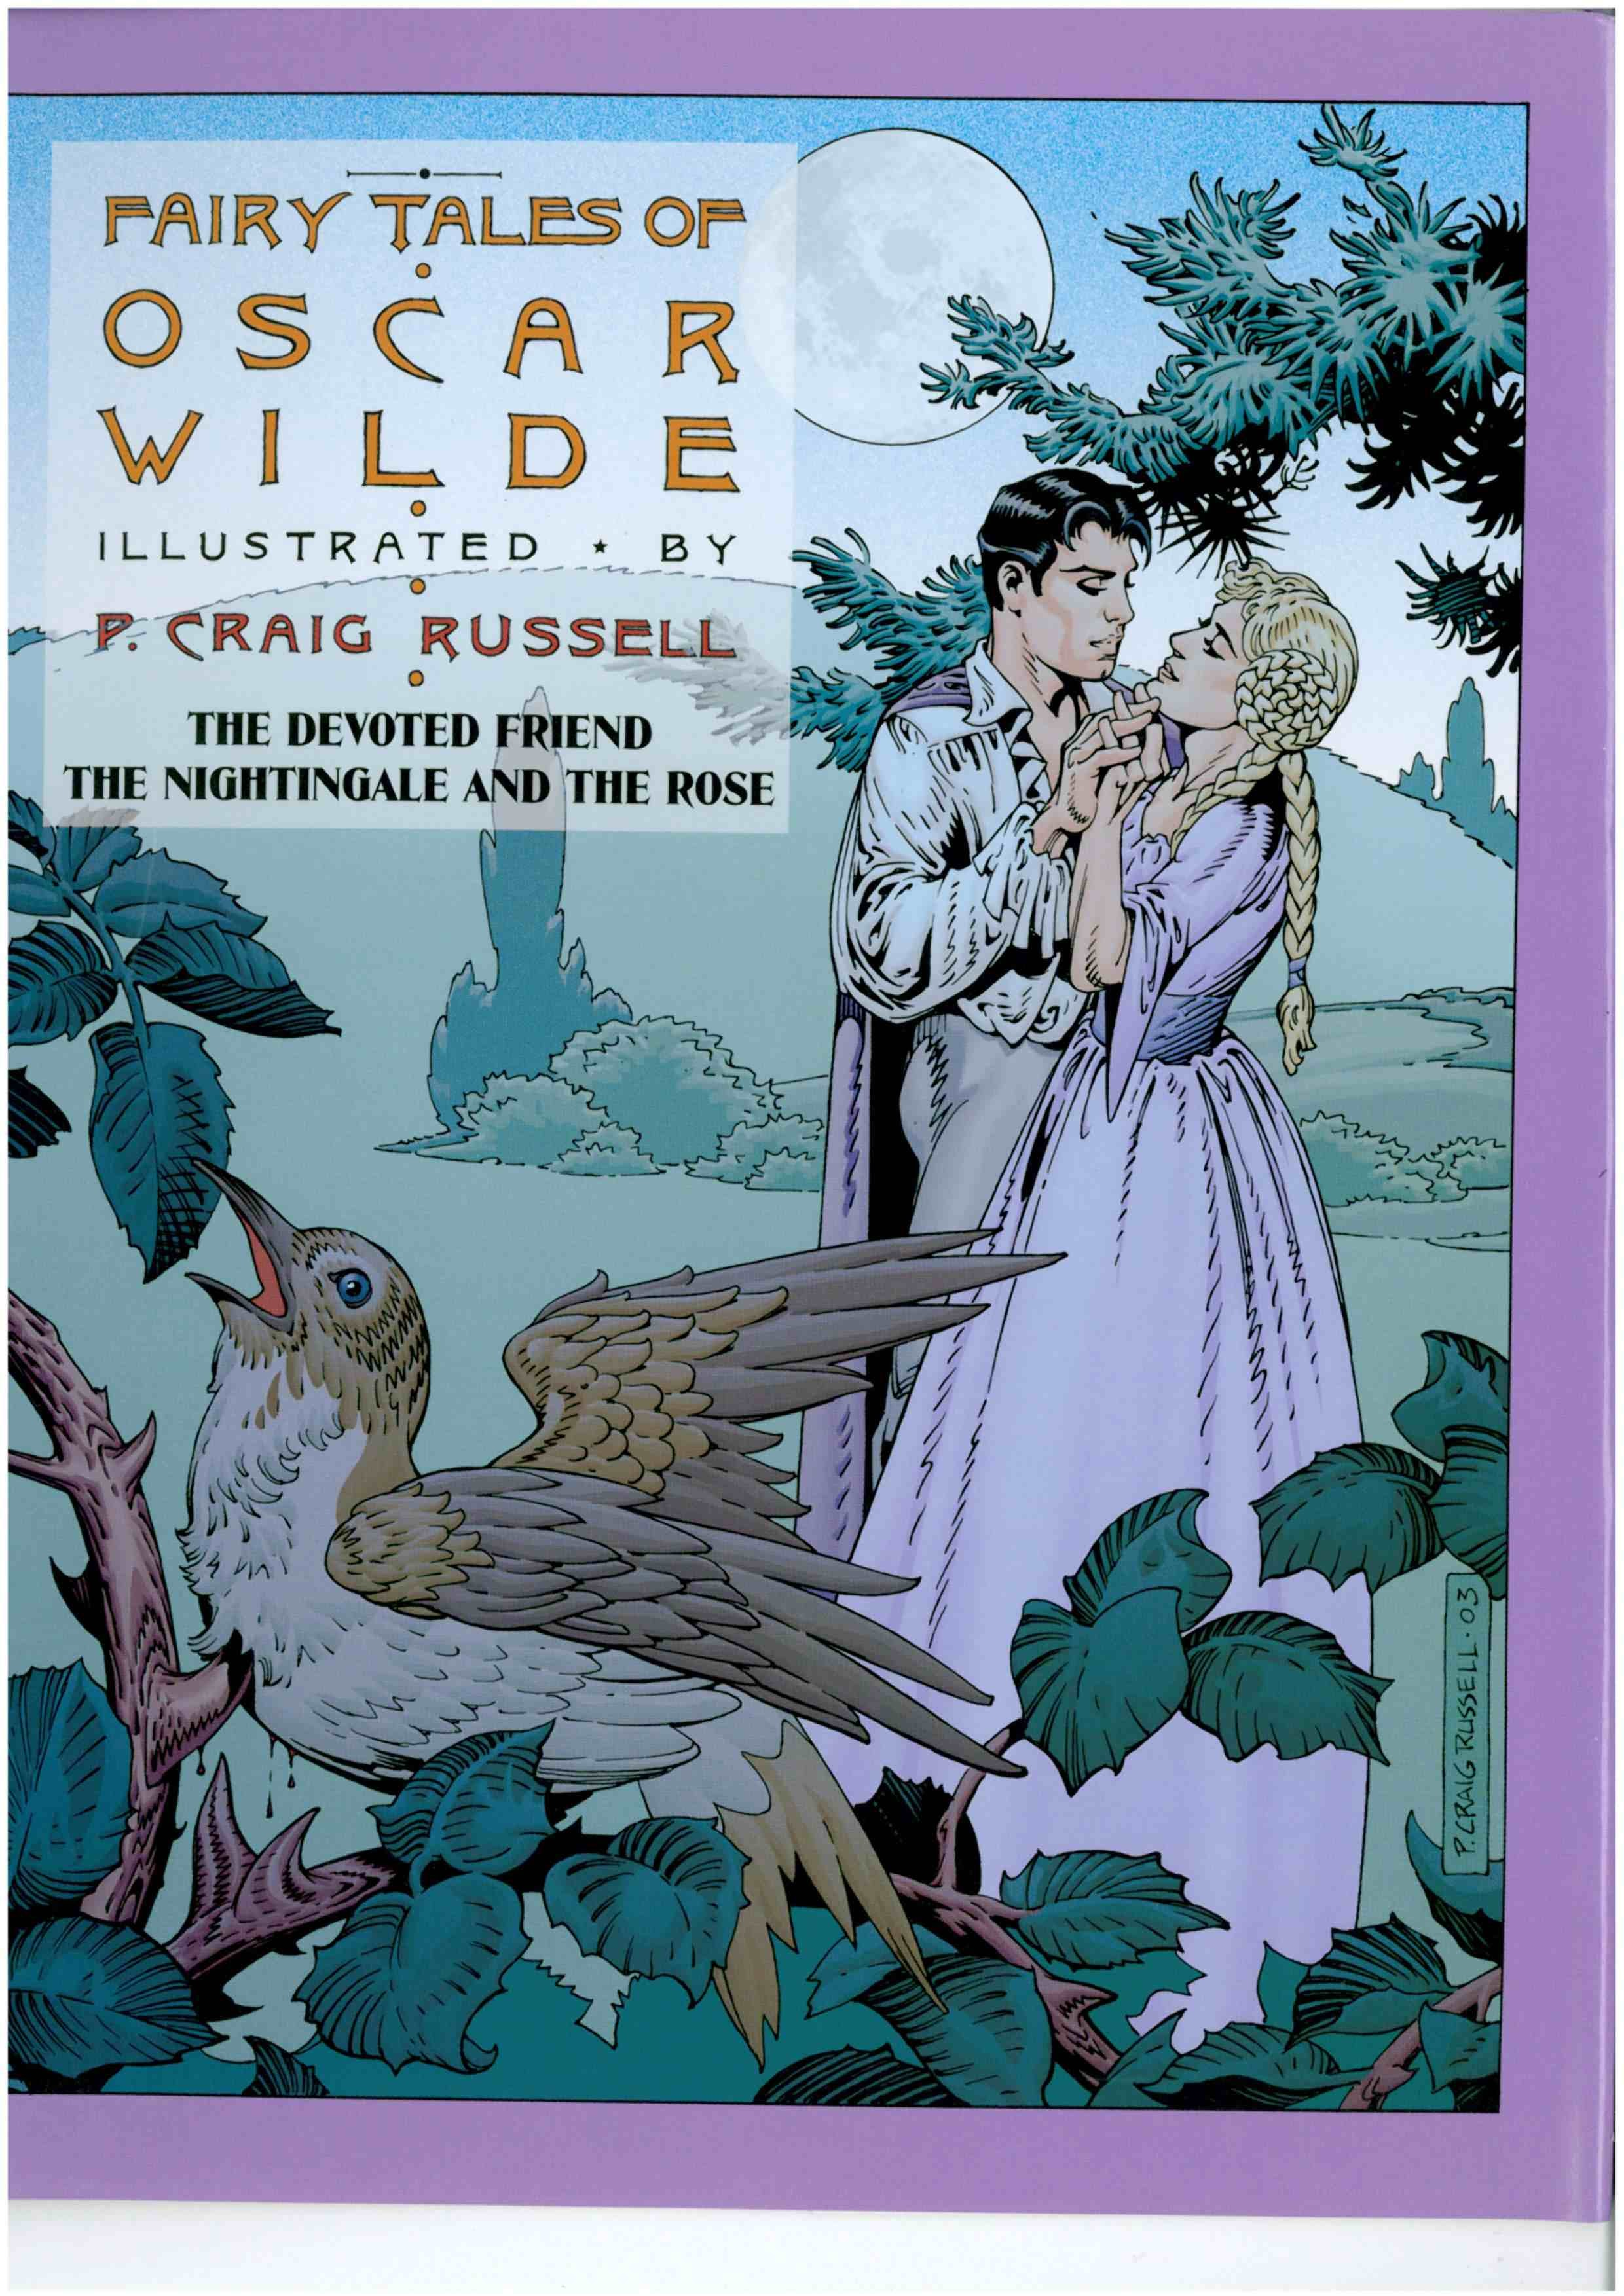 Fairy Tales of Oscar Wilde 4 Page 1